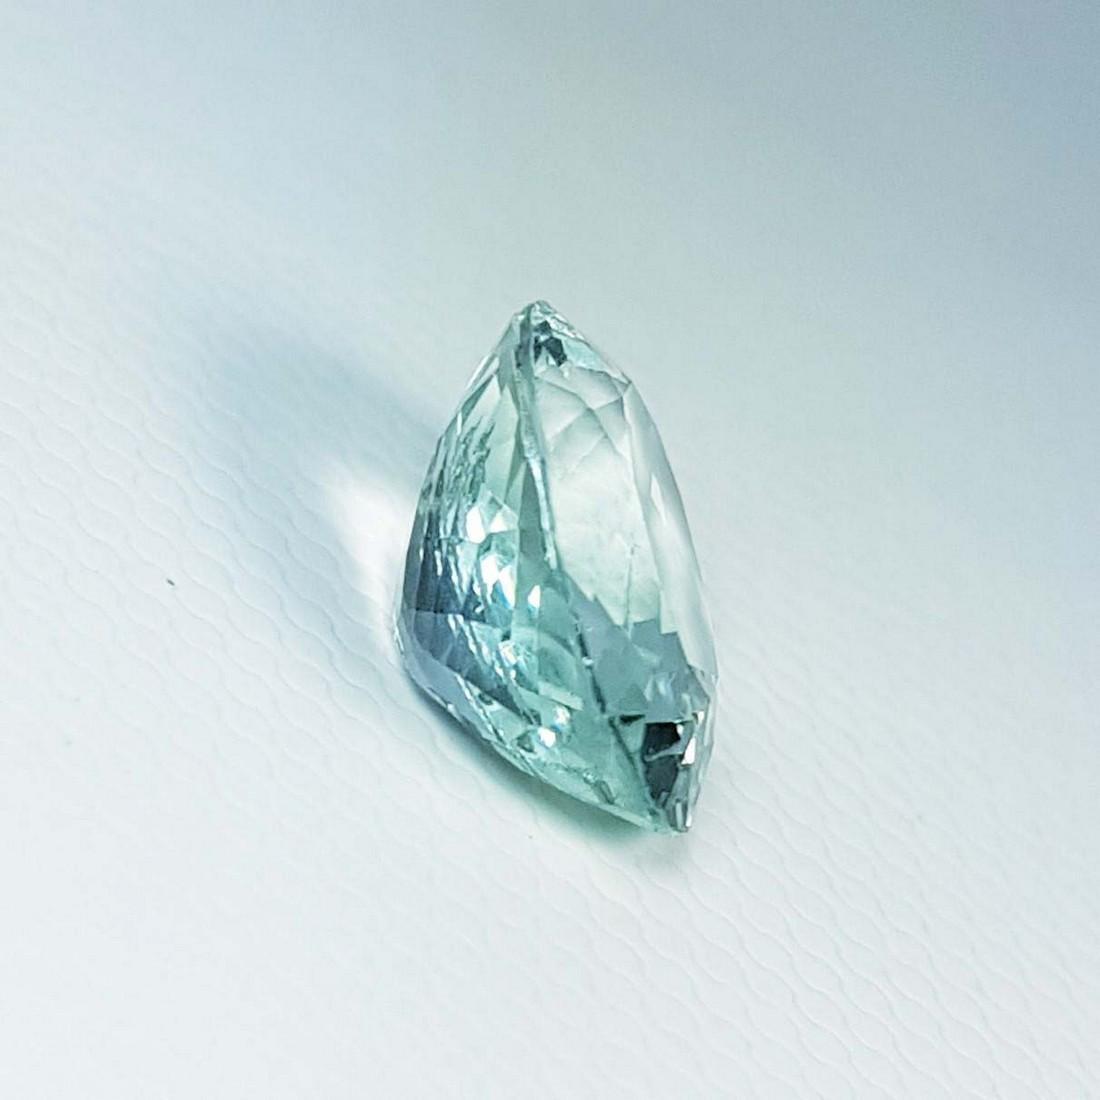 Collector Natural Aquamarine - 3.41 ct - 2